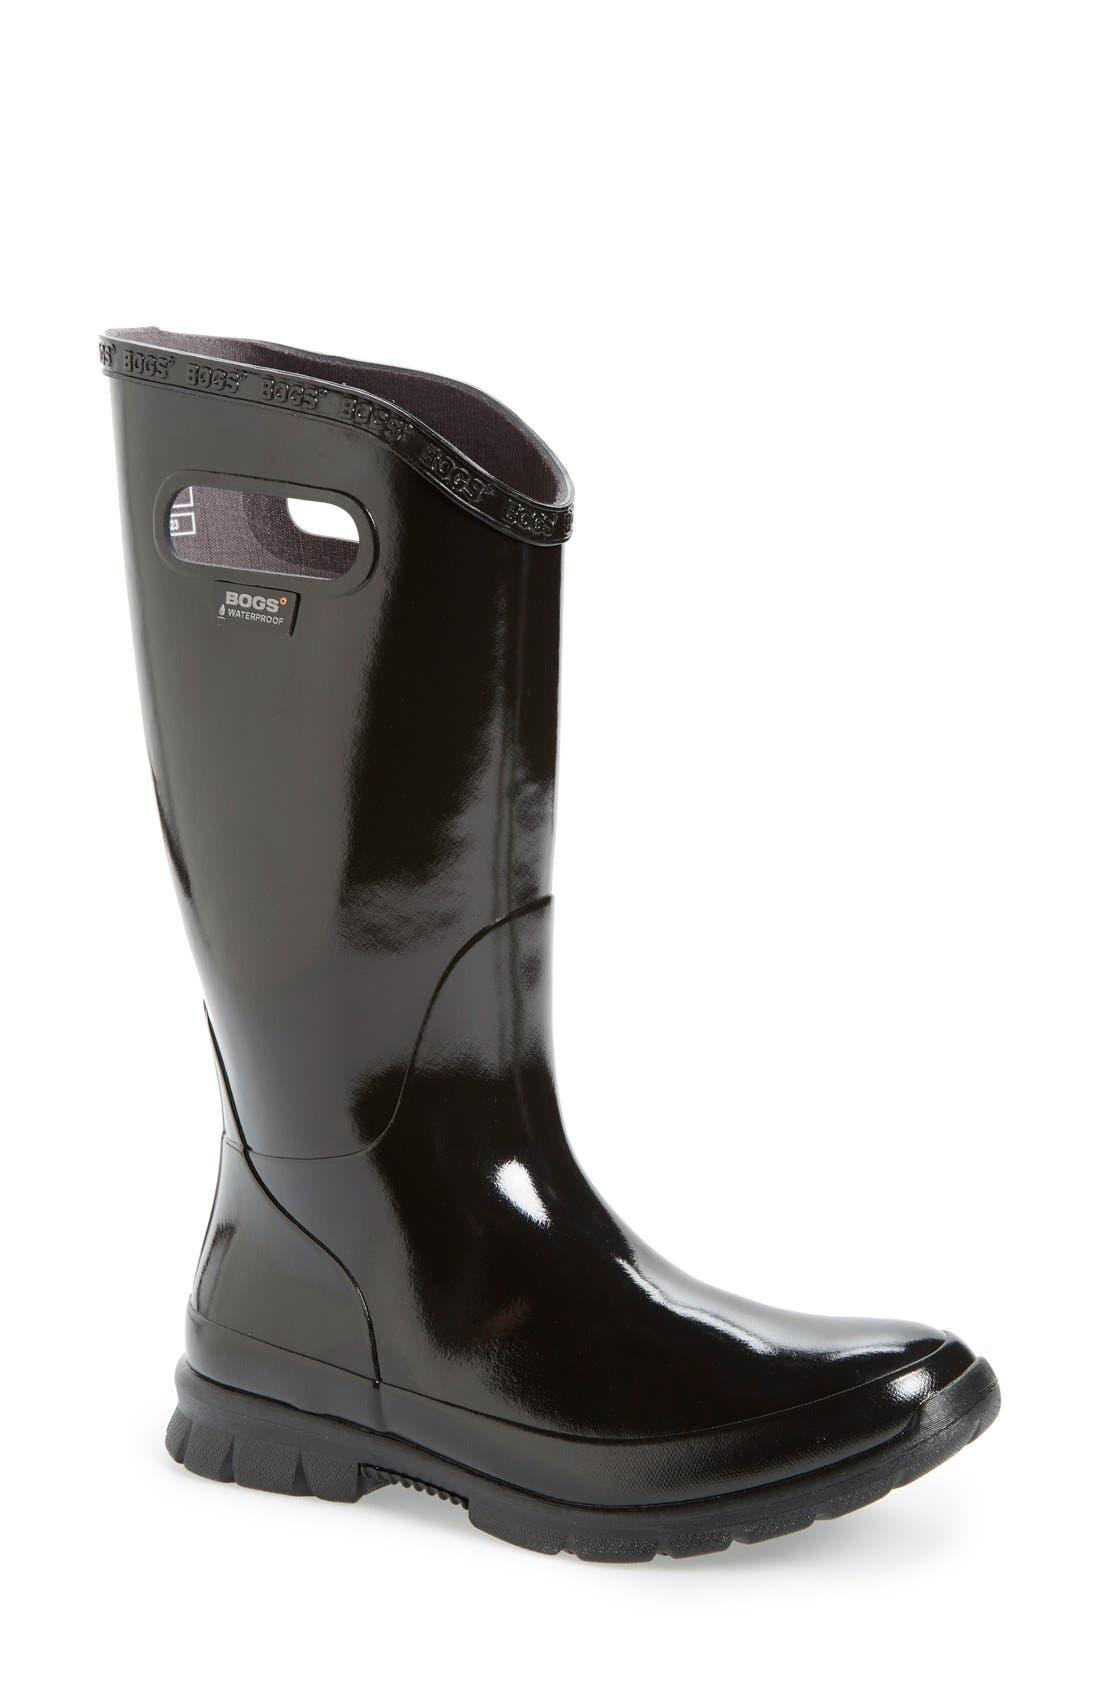 Alternate Image 1 Selected - Bogs 'Berkley' Waterproof Rain Boot (Women)